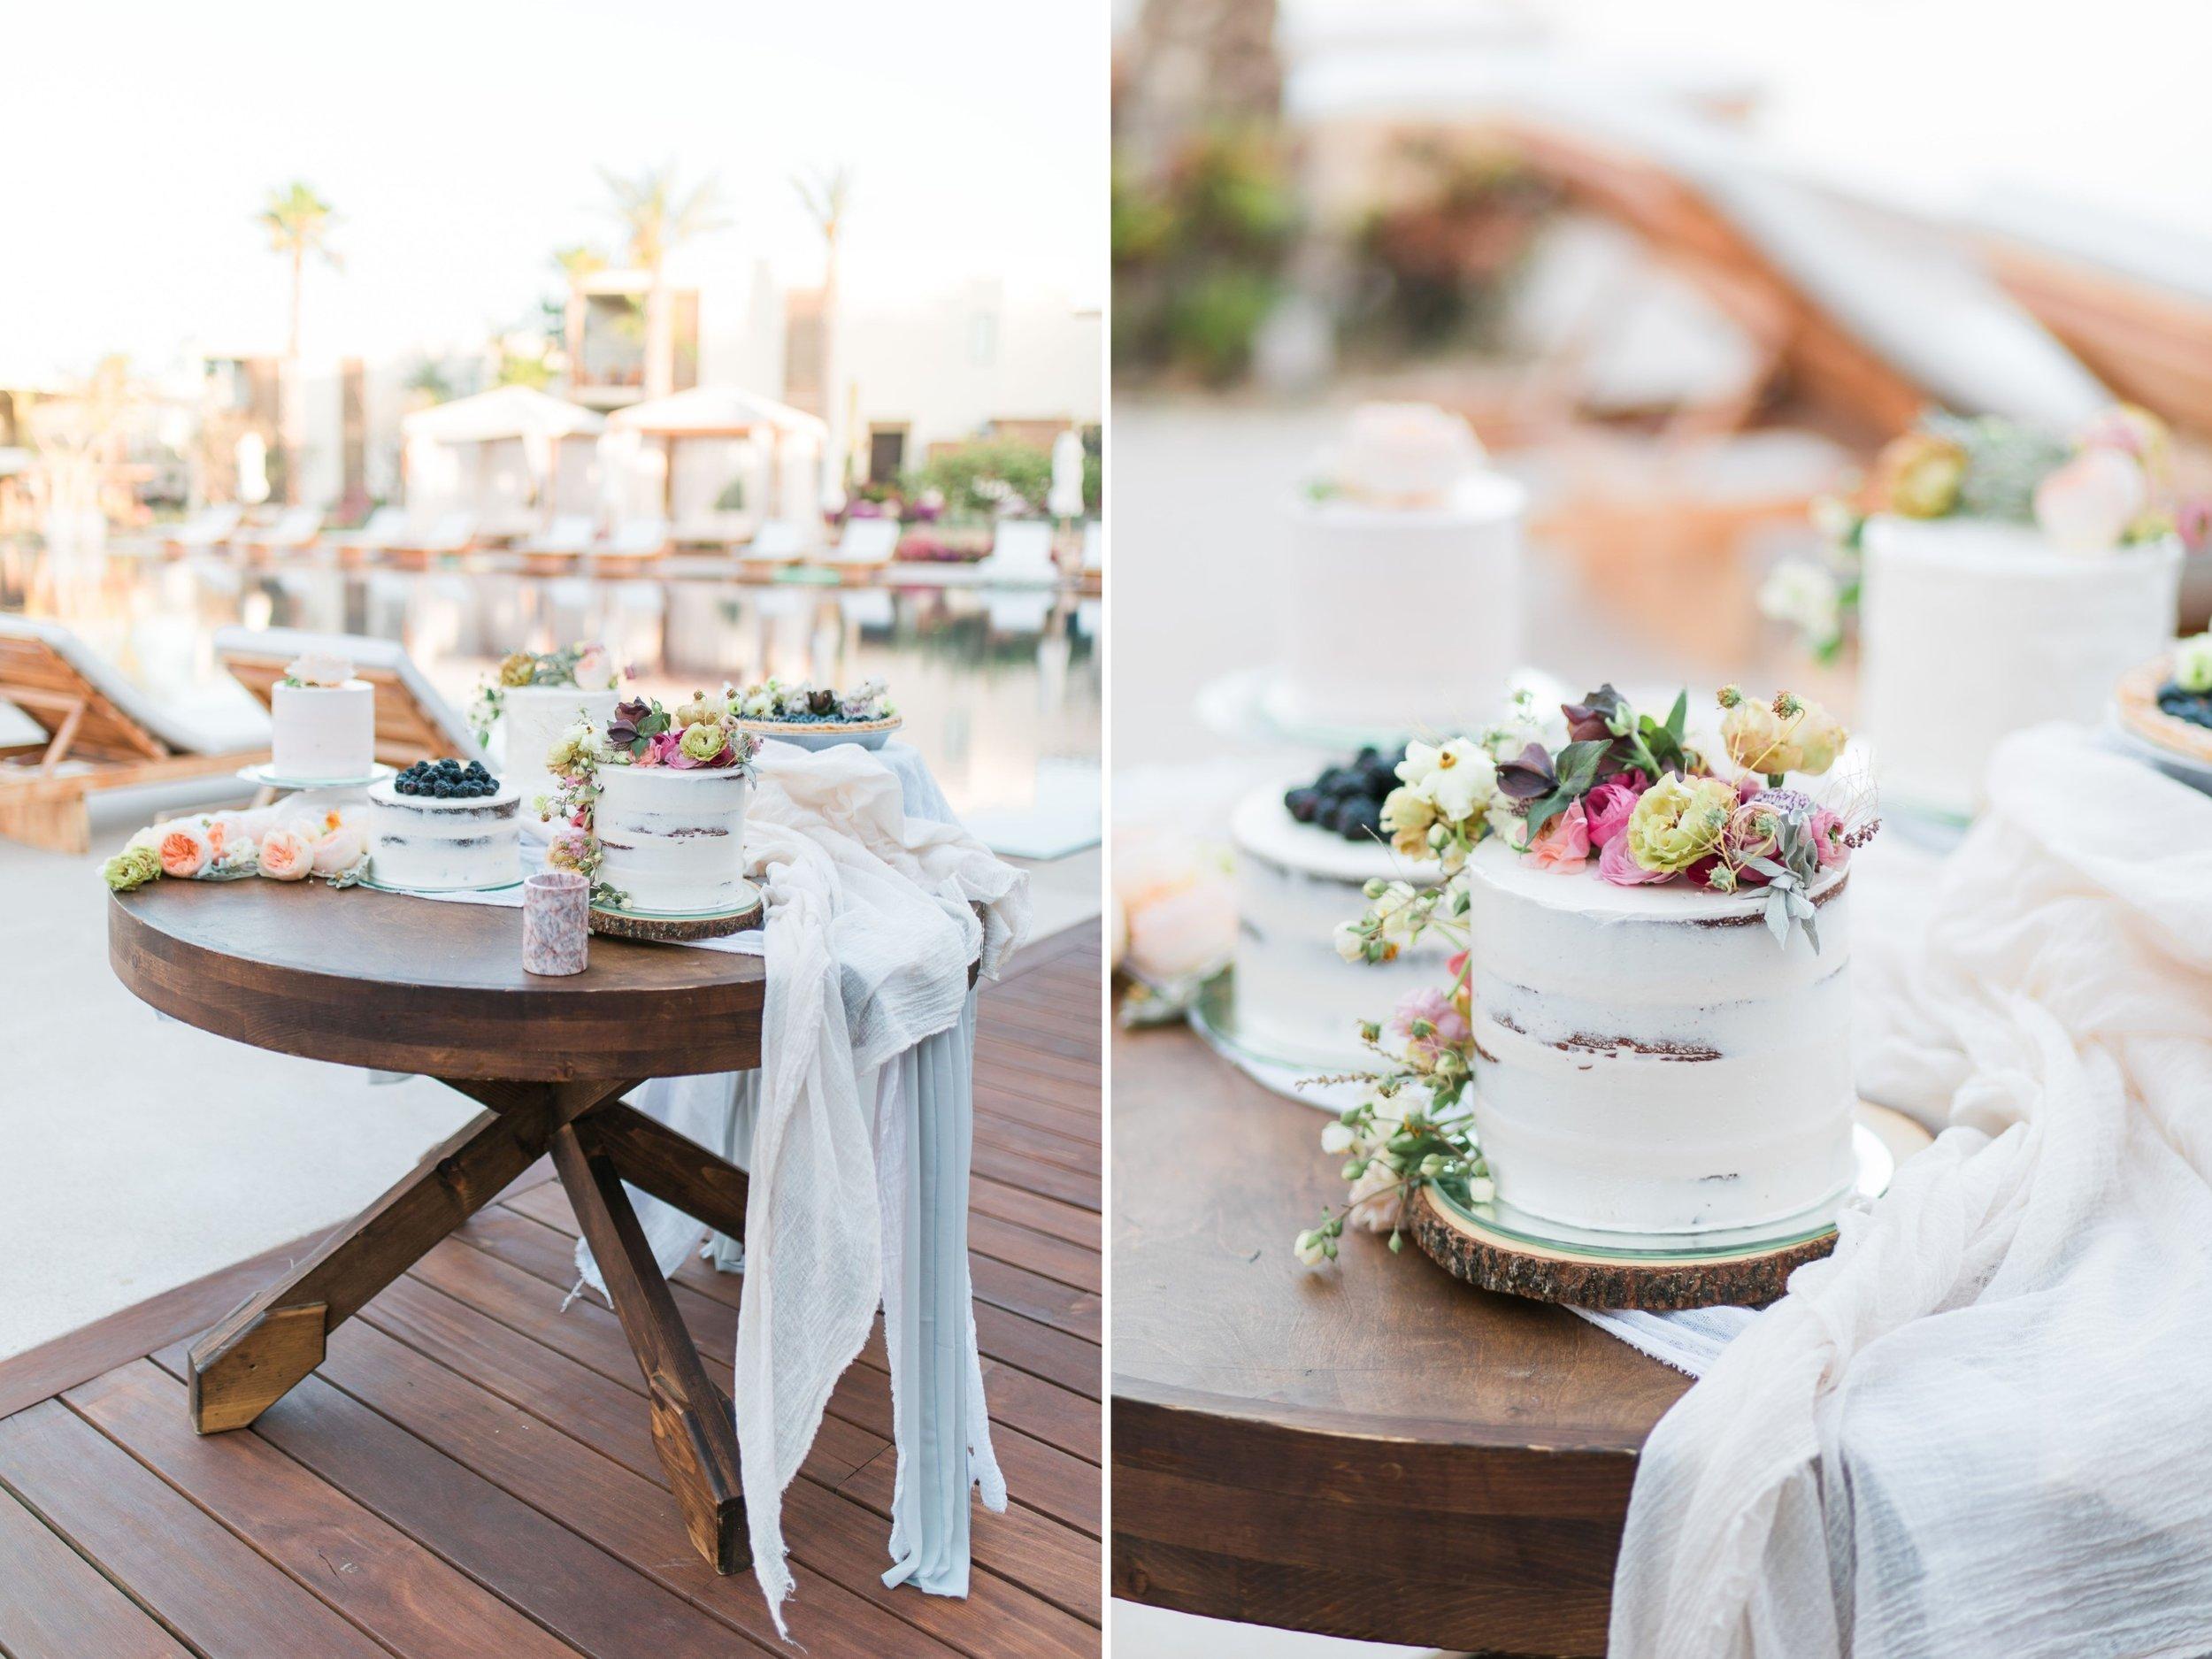 Los Cabos Wedding Photographer - Destination Wedding - Chileno Bay Resort Wedding Photos (24).jpg